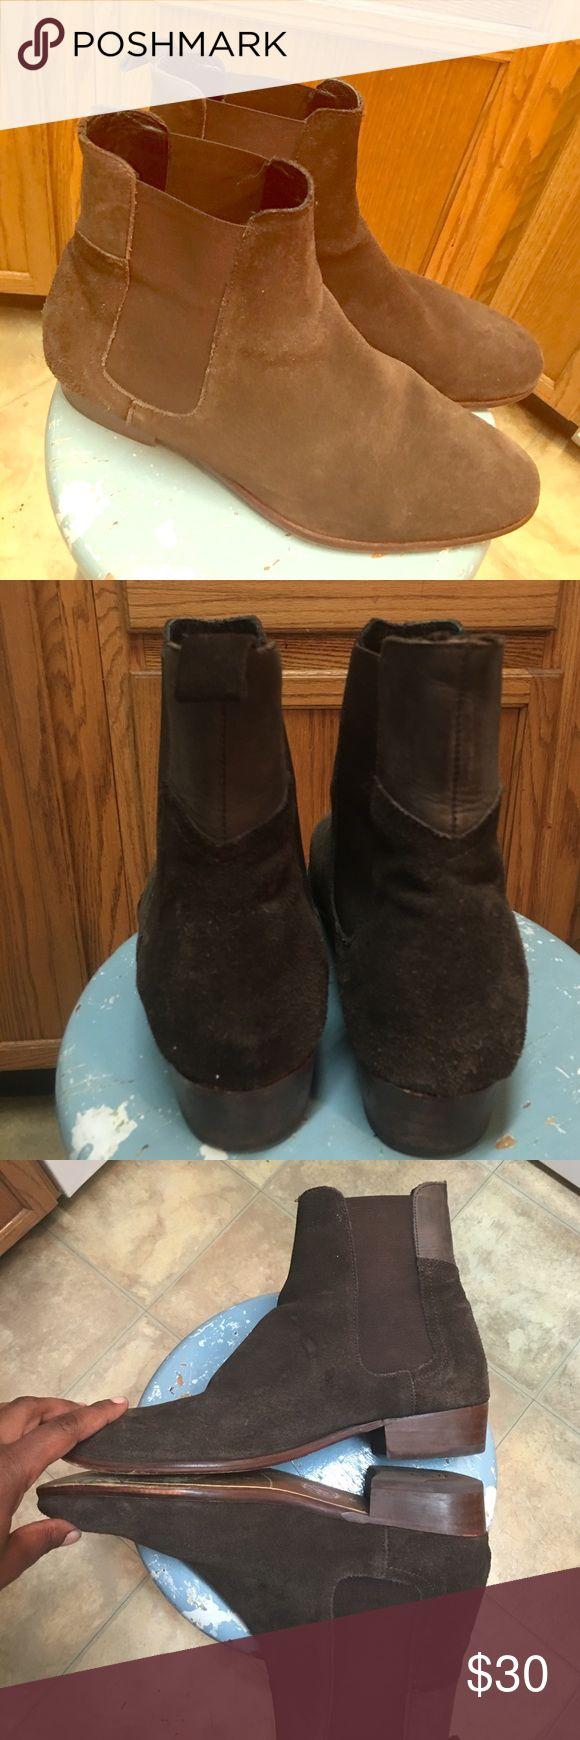 Men's Brown suede boots Men's brown suede boots. Shoes Boots